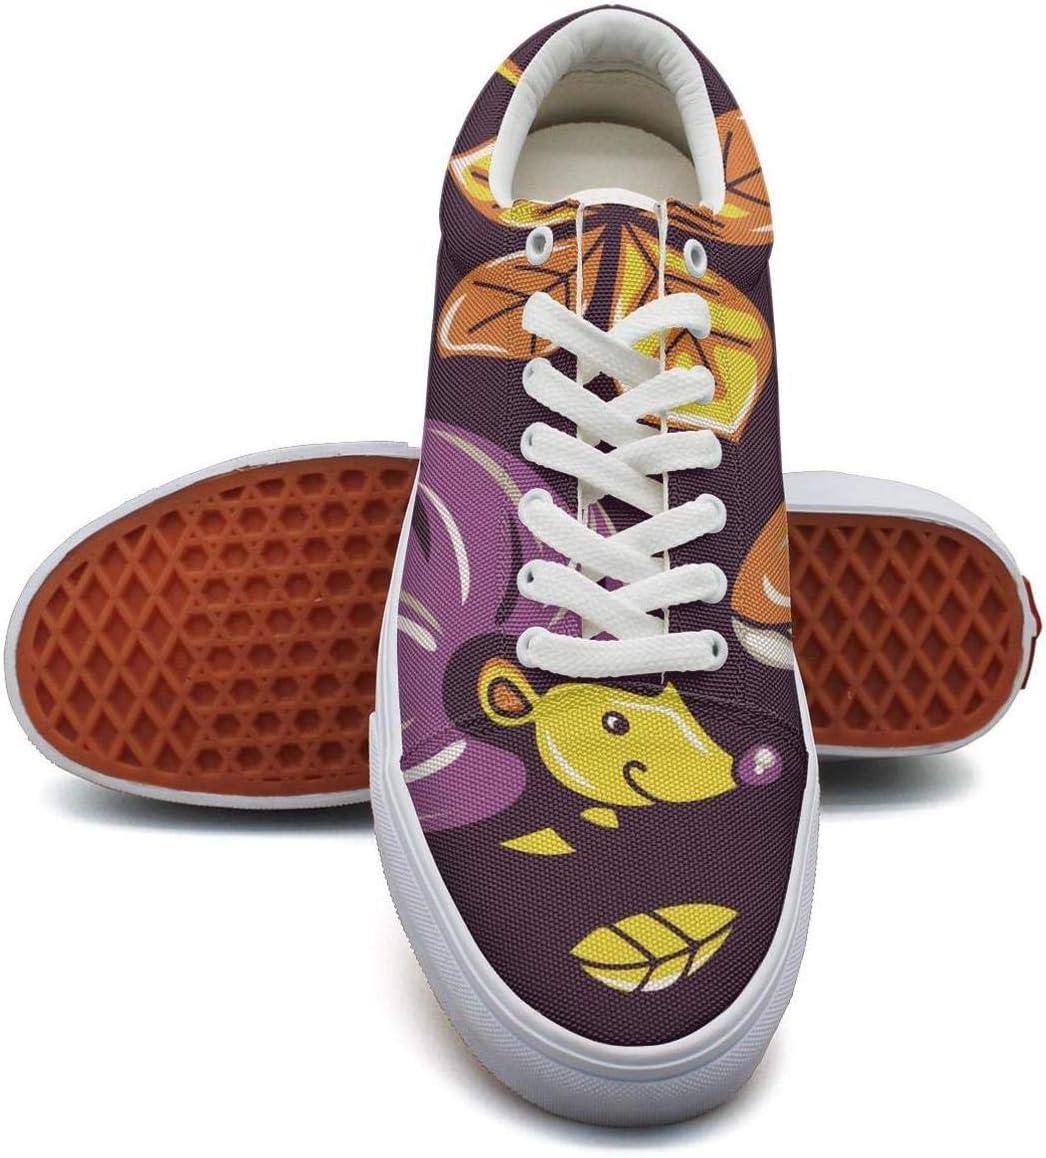 Ouxioaz Womens Skateboarding Shoes Canvas Mushrooms Sport Sneaker